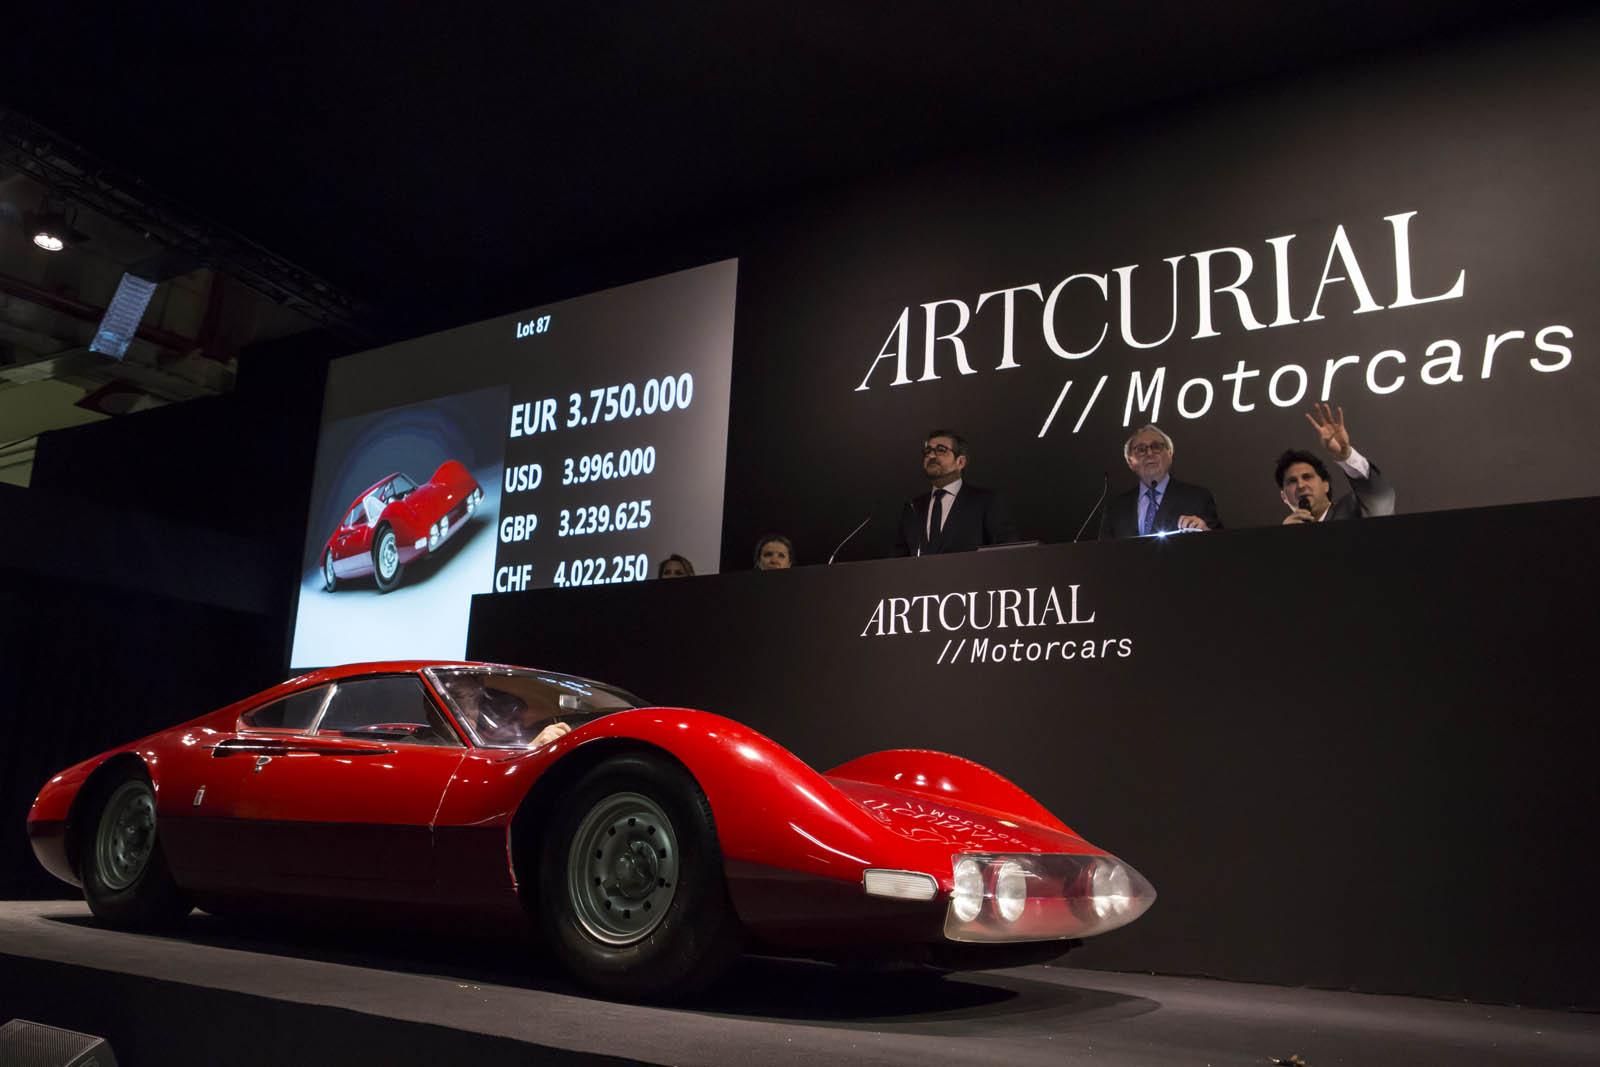 Lot+87+1966+Dino+206+P+Berlinetta+Speciale+%C2%A9Artcurial_2+copy